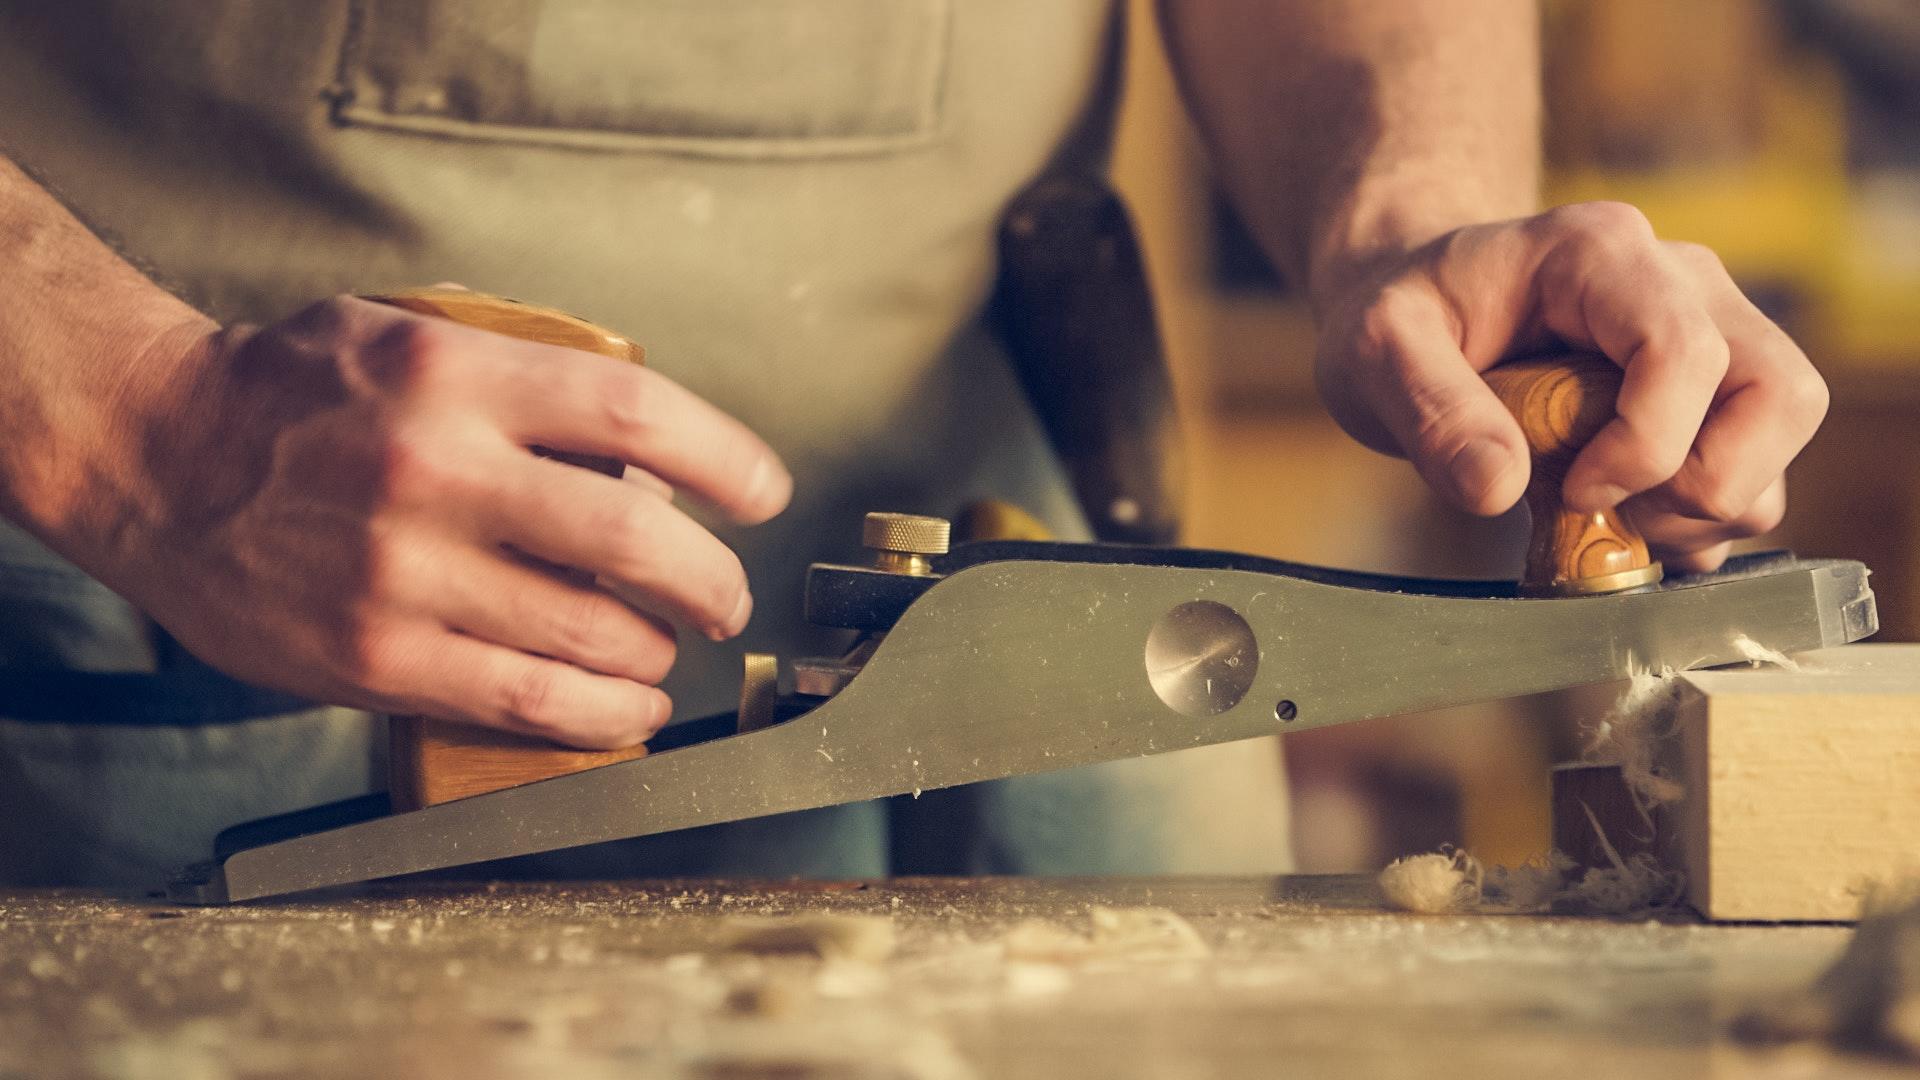 carpenter-close-up-hands-374861